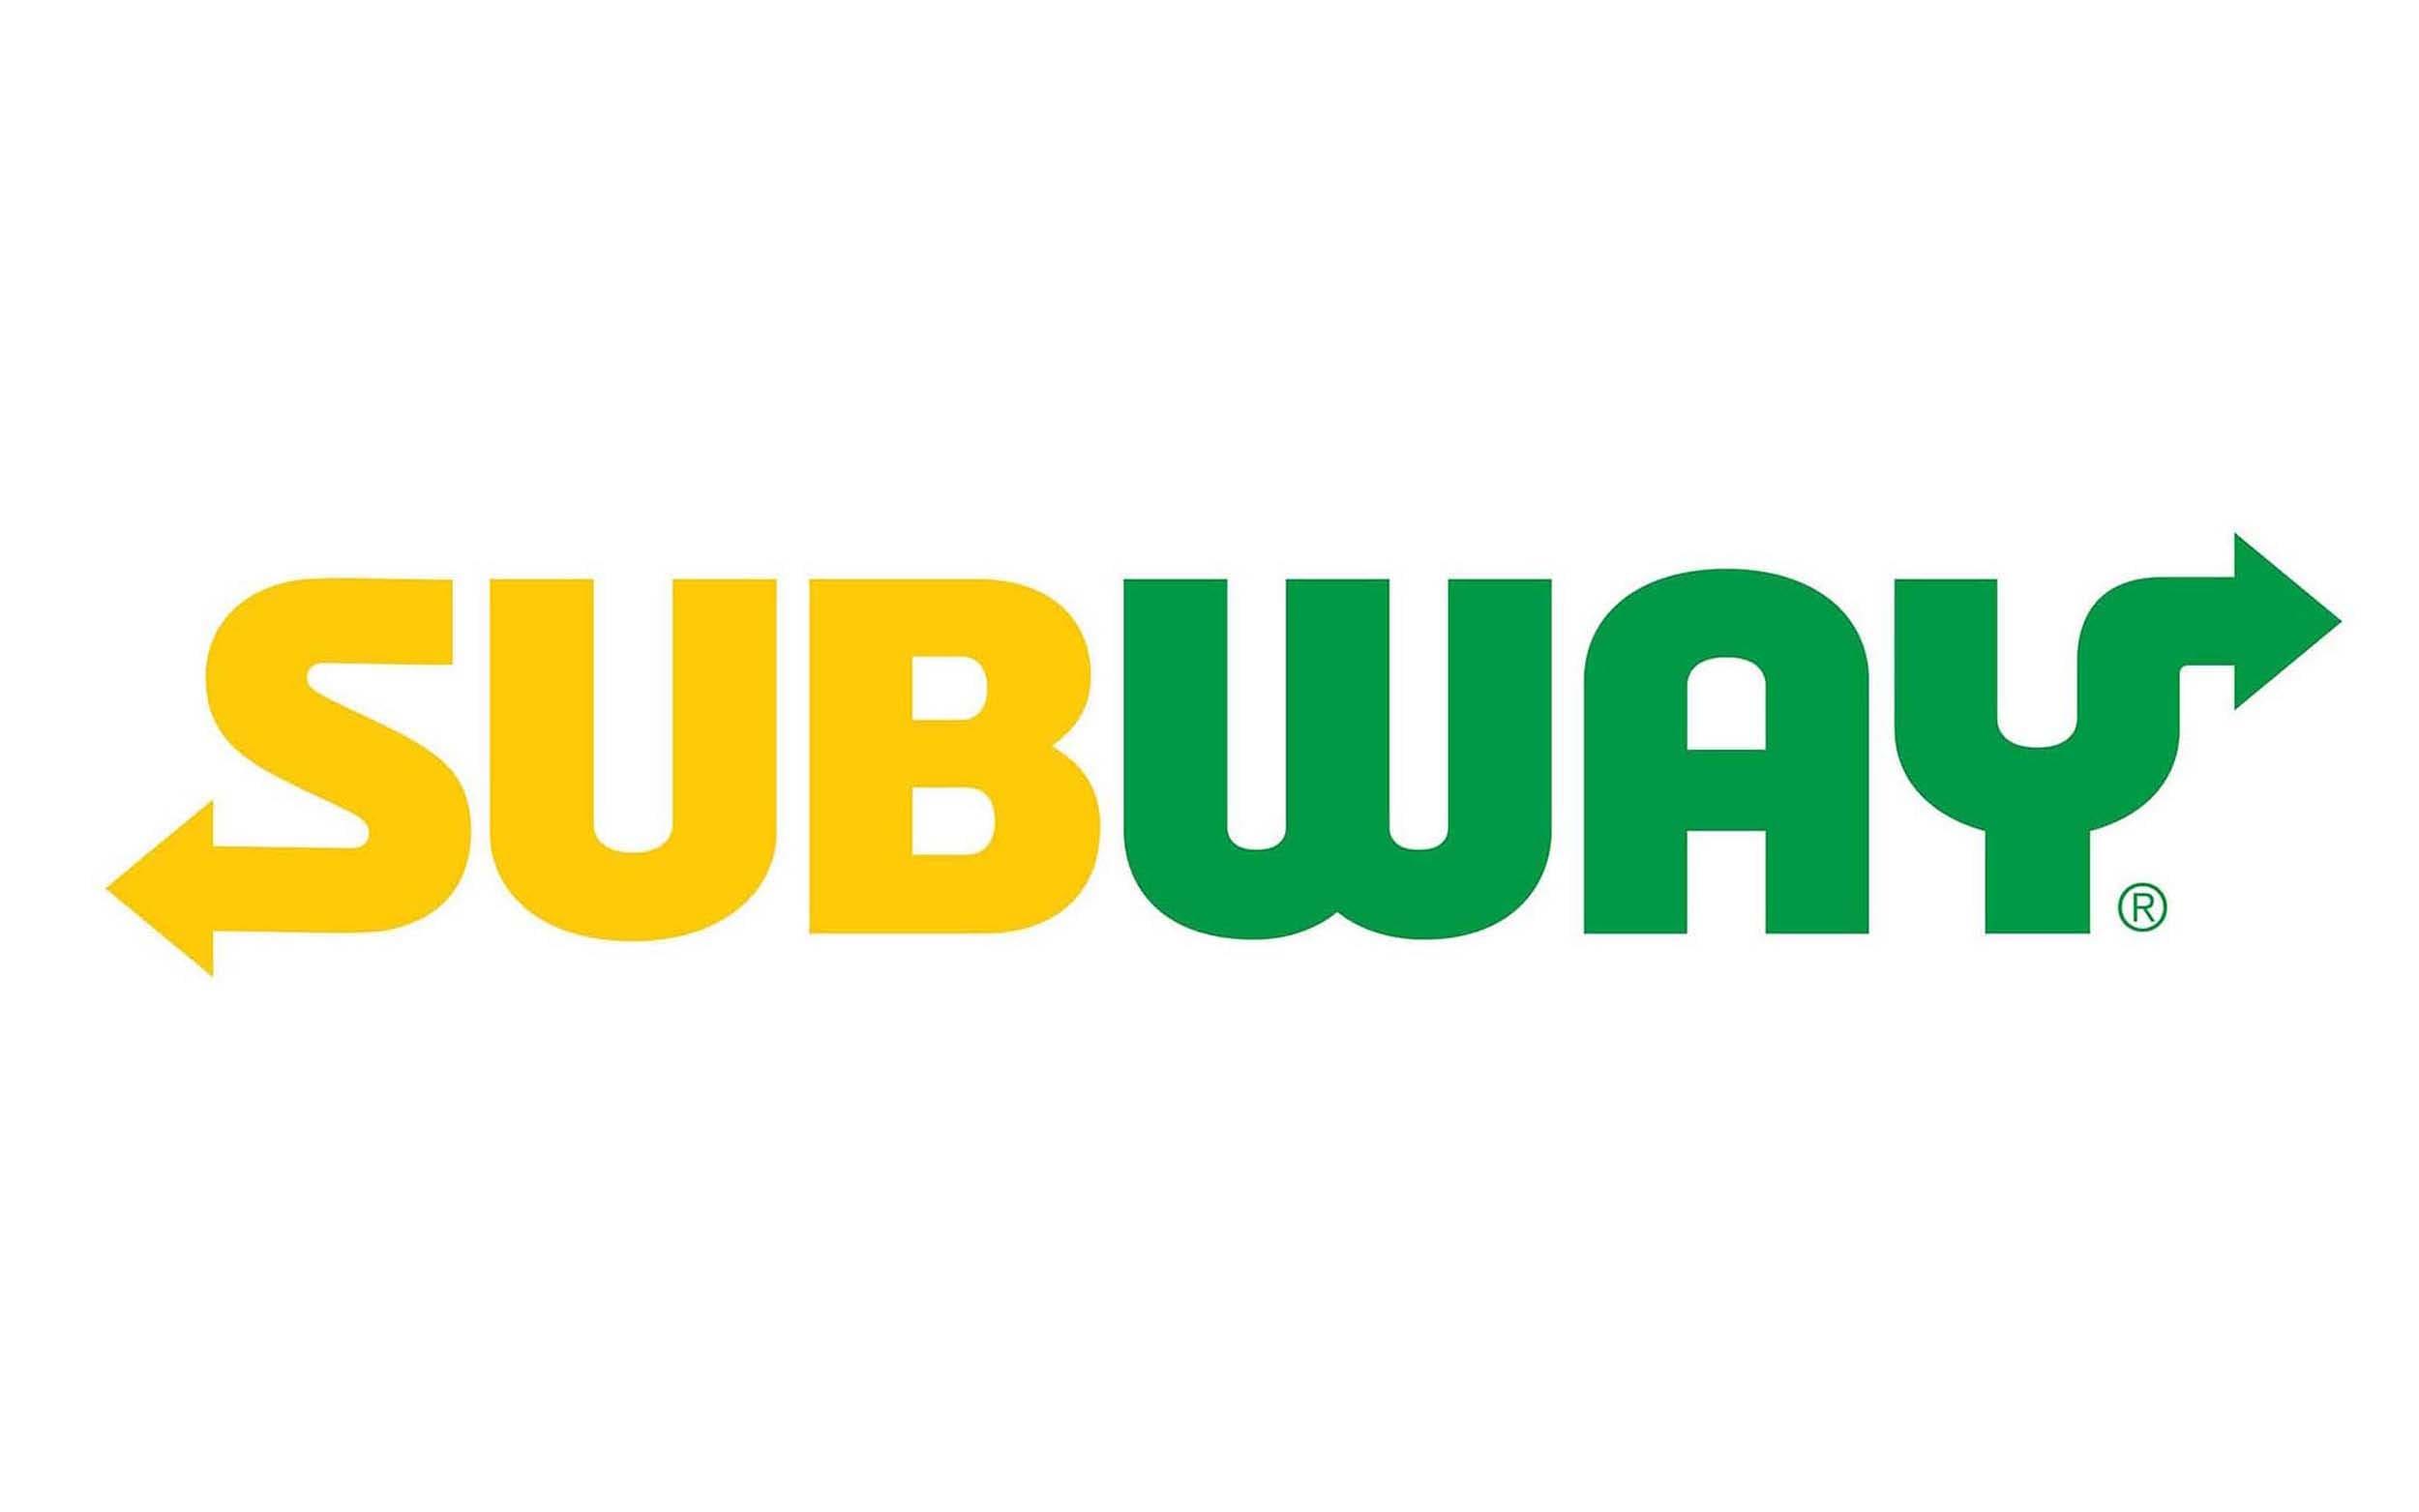 https://aluguelcorporativo.multiimoveis.com/wp-content/uploads/2021/06/Subway.jpg